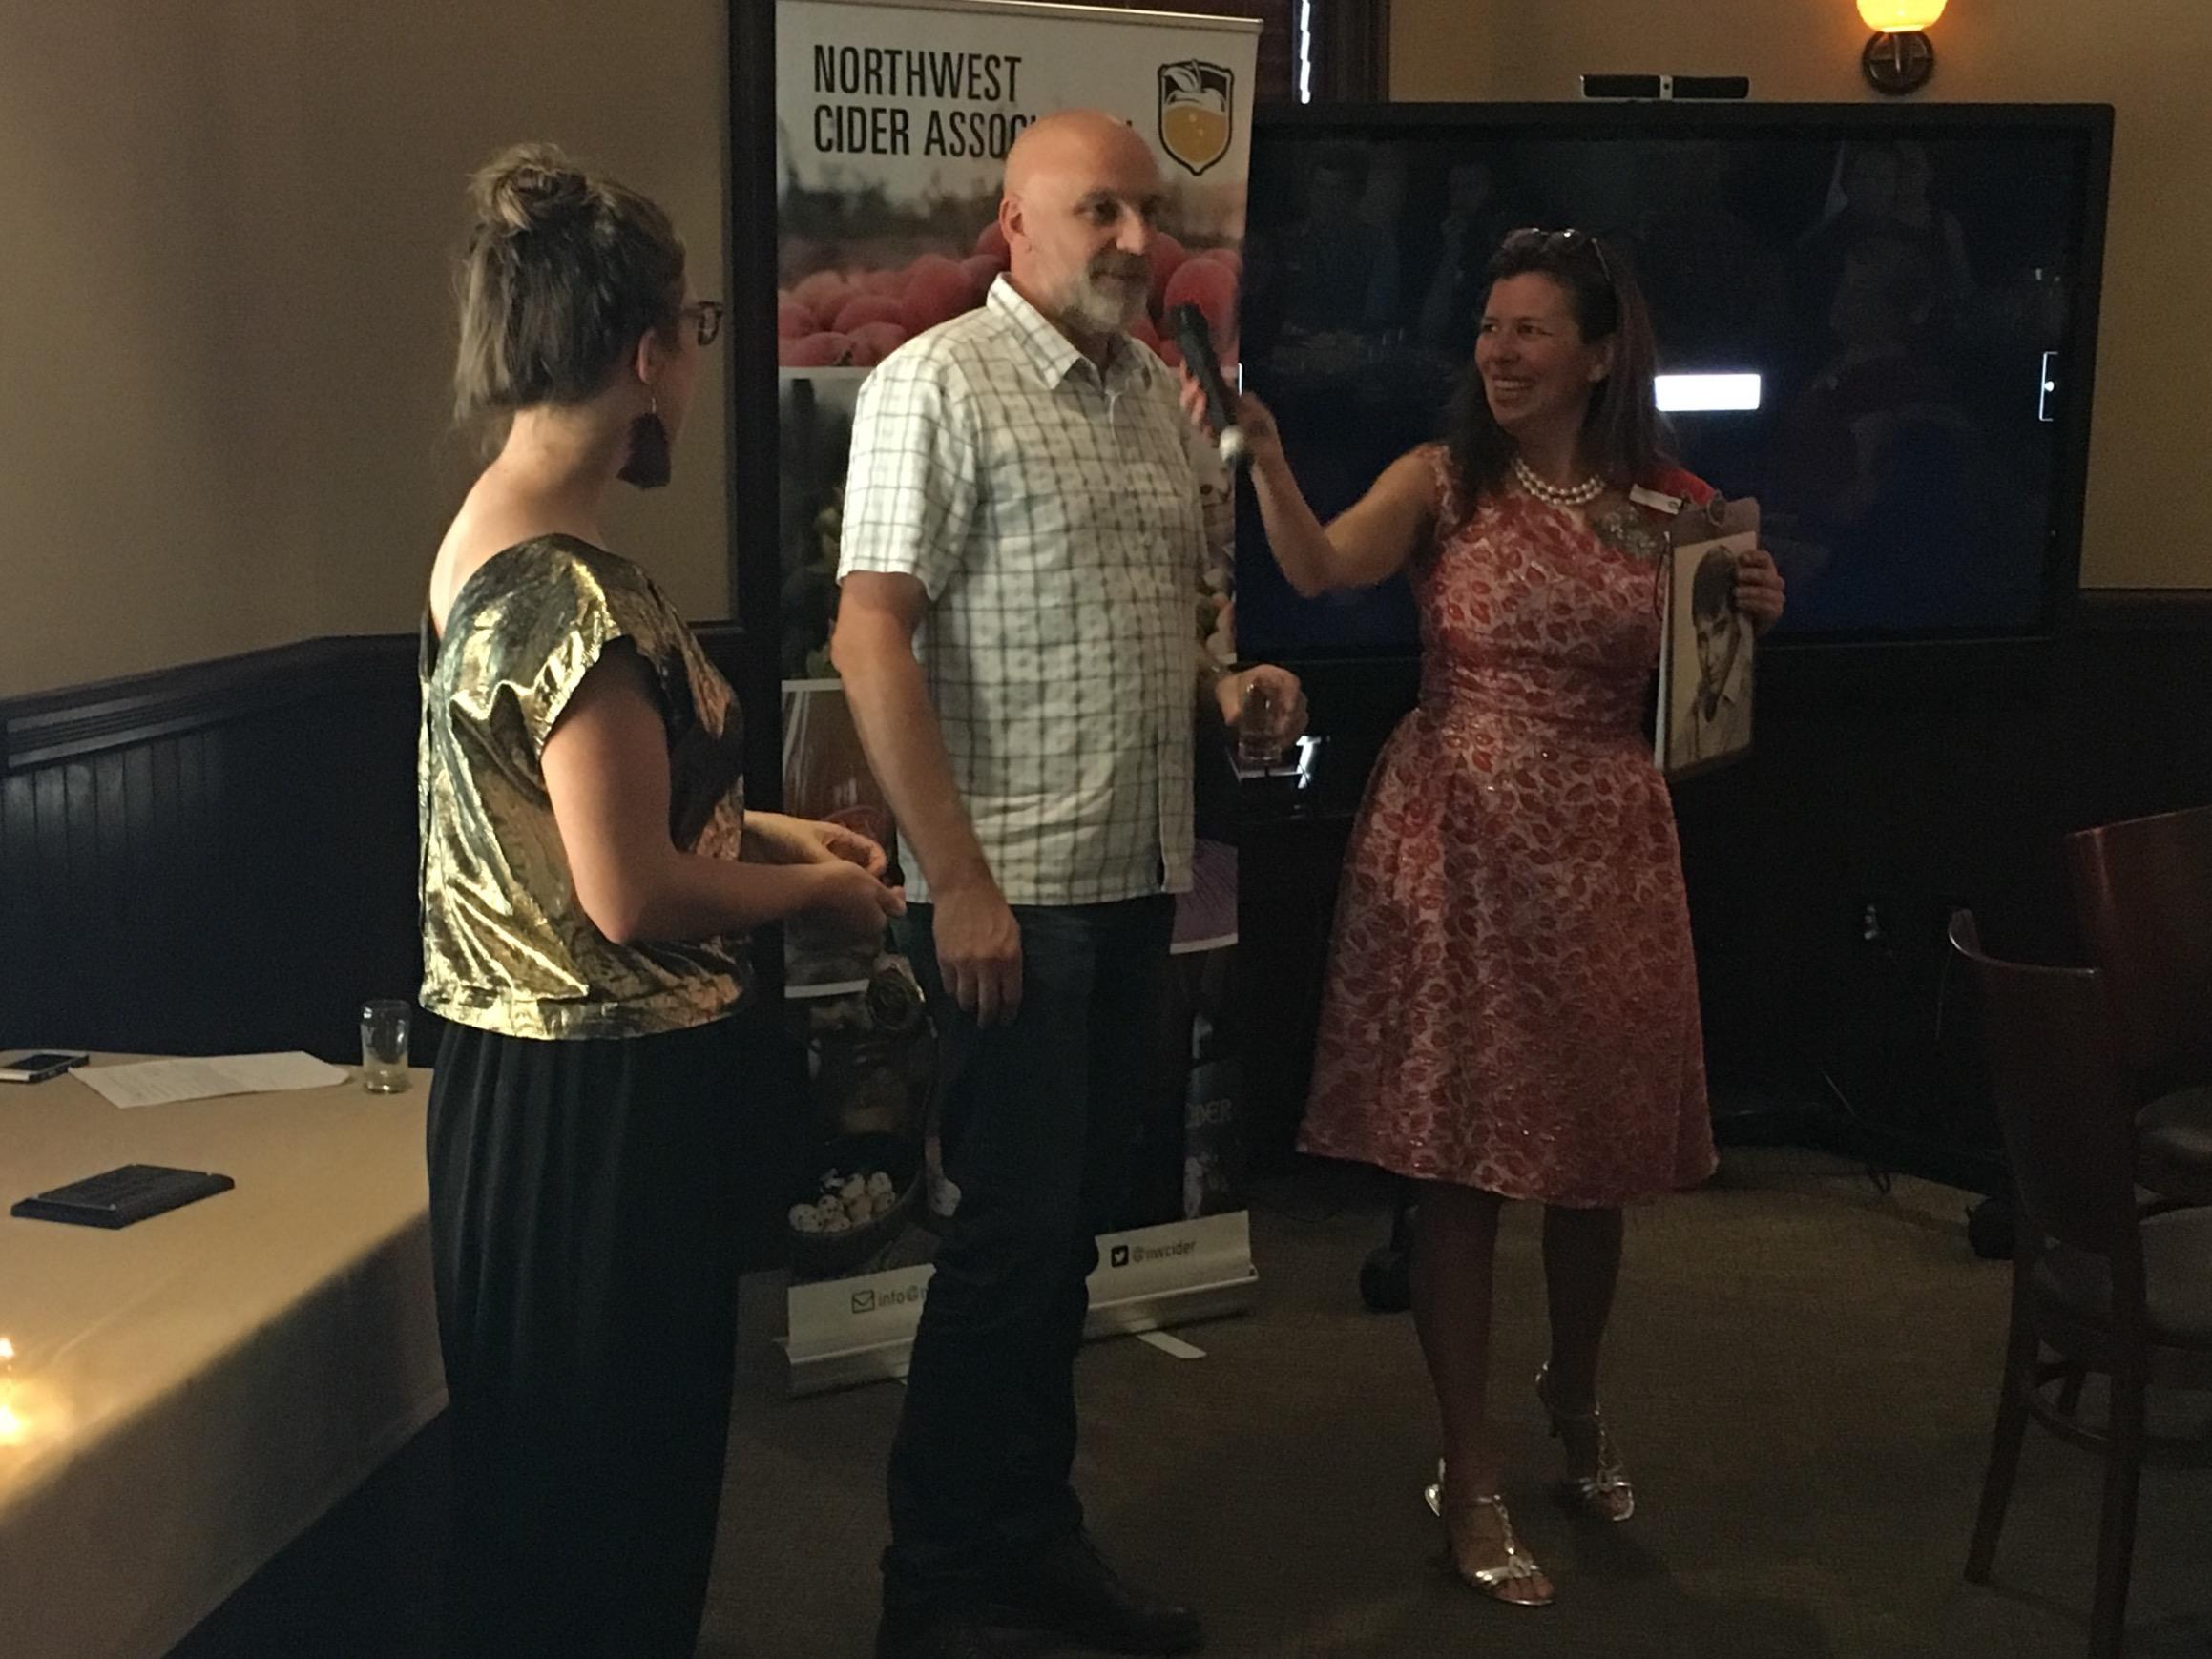 Doug Rehberg from Square Mile Cider is awarded the Gold Medal for Spur & Vine Hopped Cider at the 2016 Portland International Cider Cup Awards.